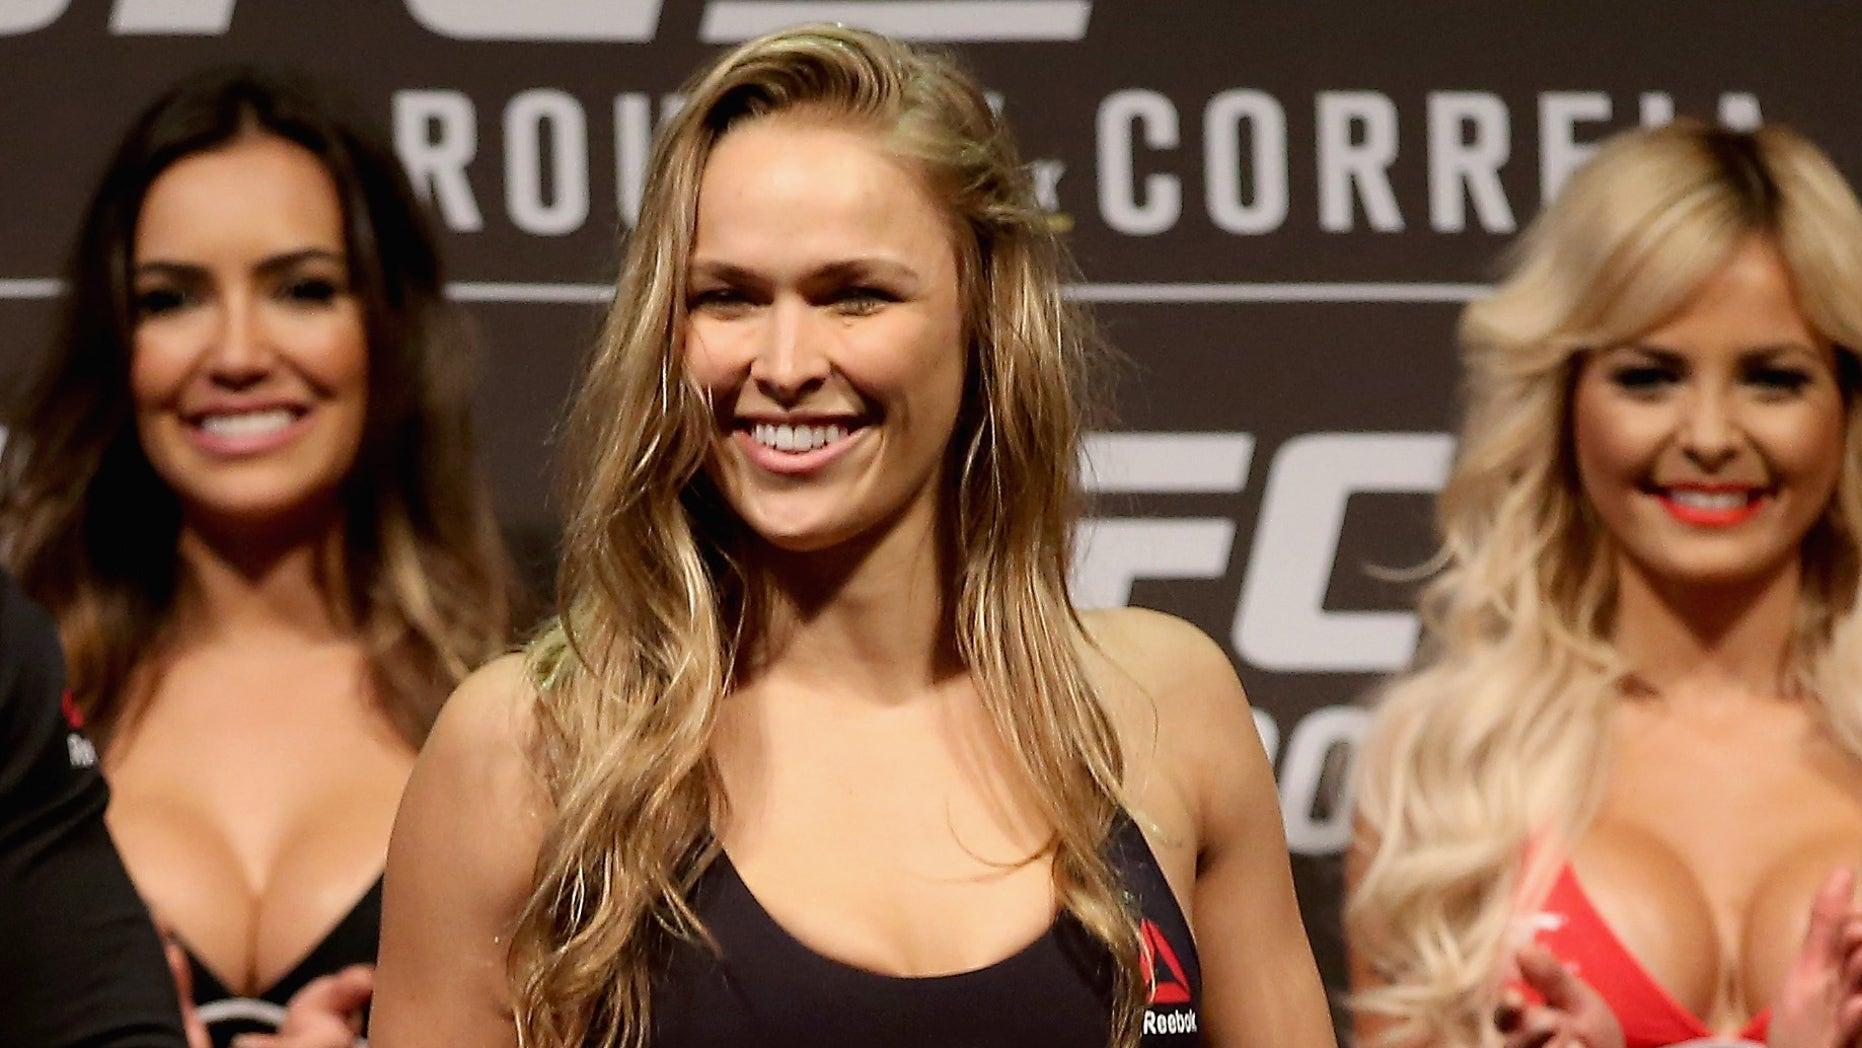 UFC Strawweight Champion Ronda Rousey on July 31, 2015 in Rio de Janeiro, Brazil.